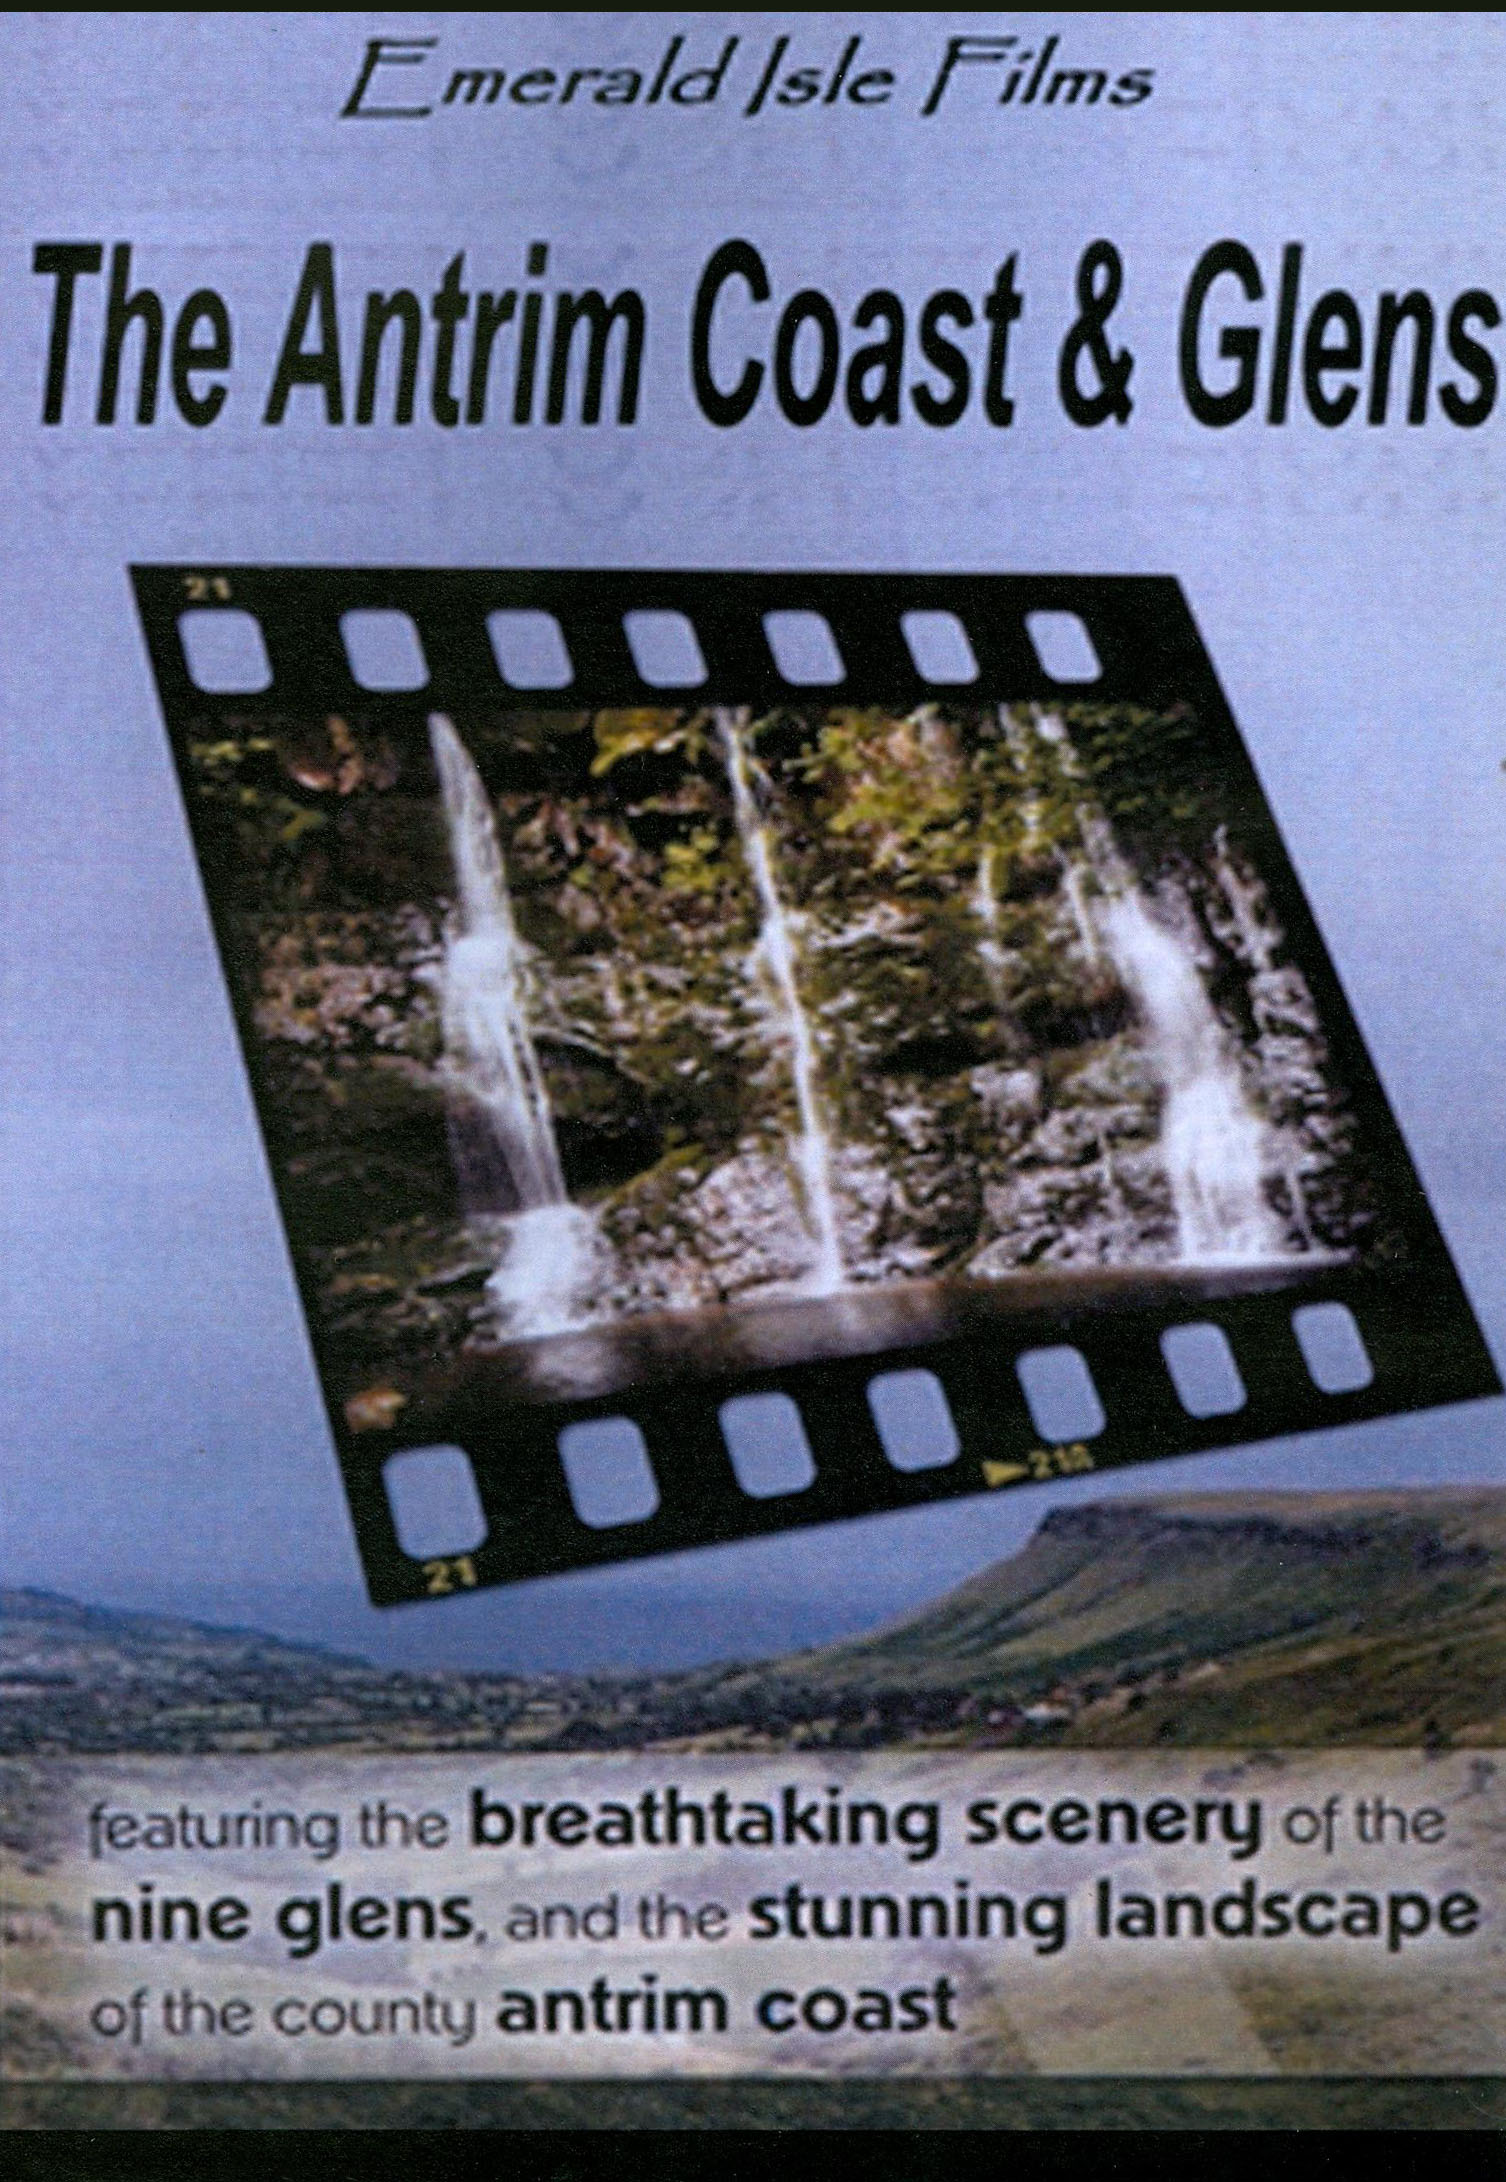 Antrim Coast & Glens